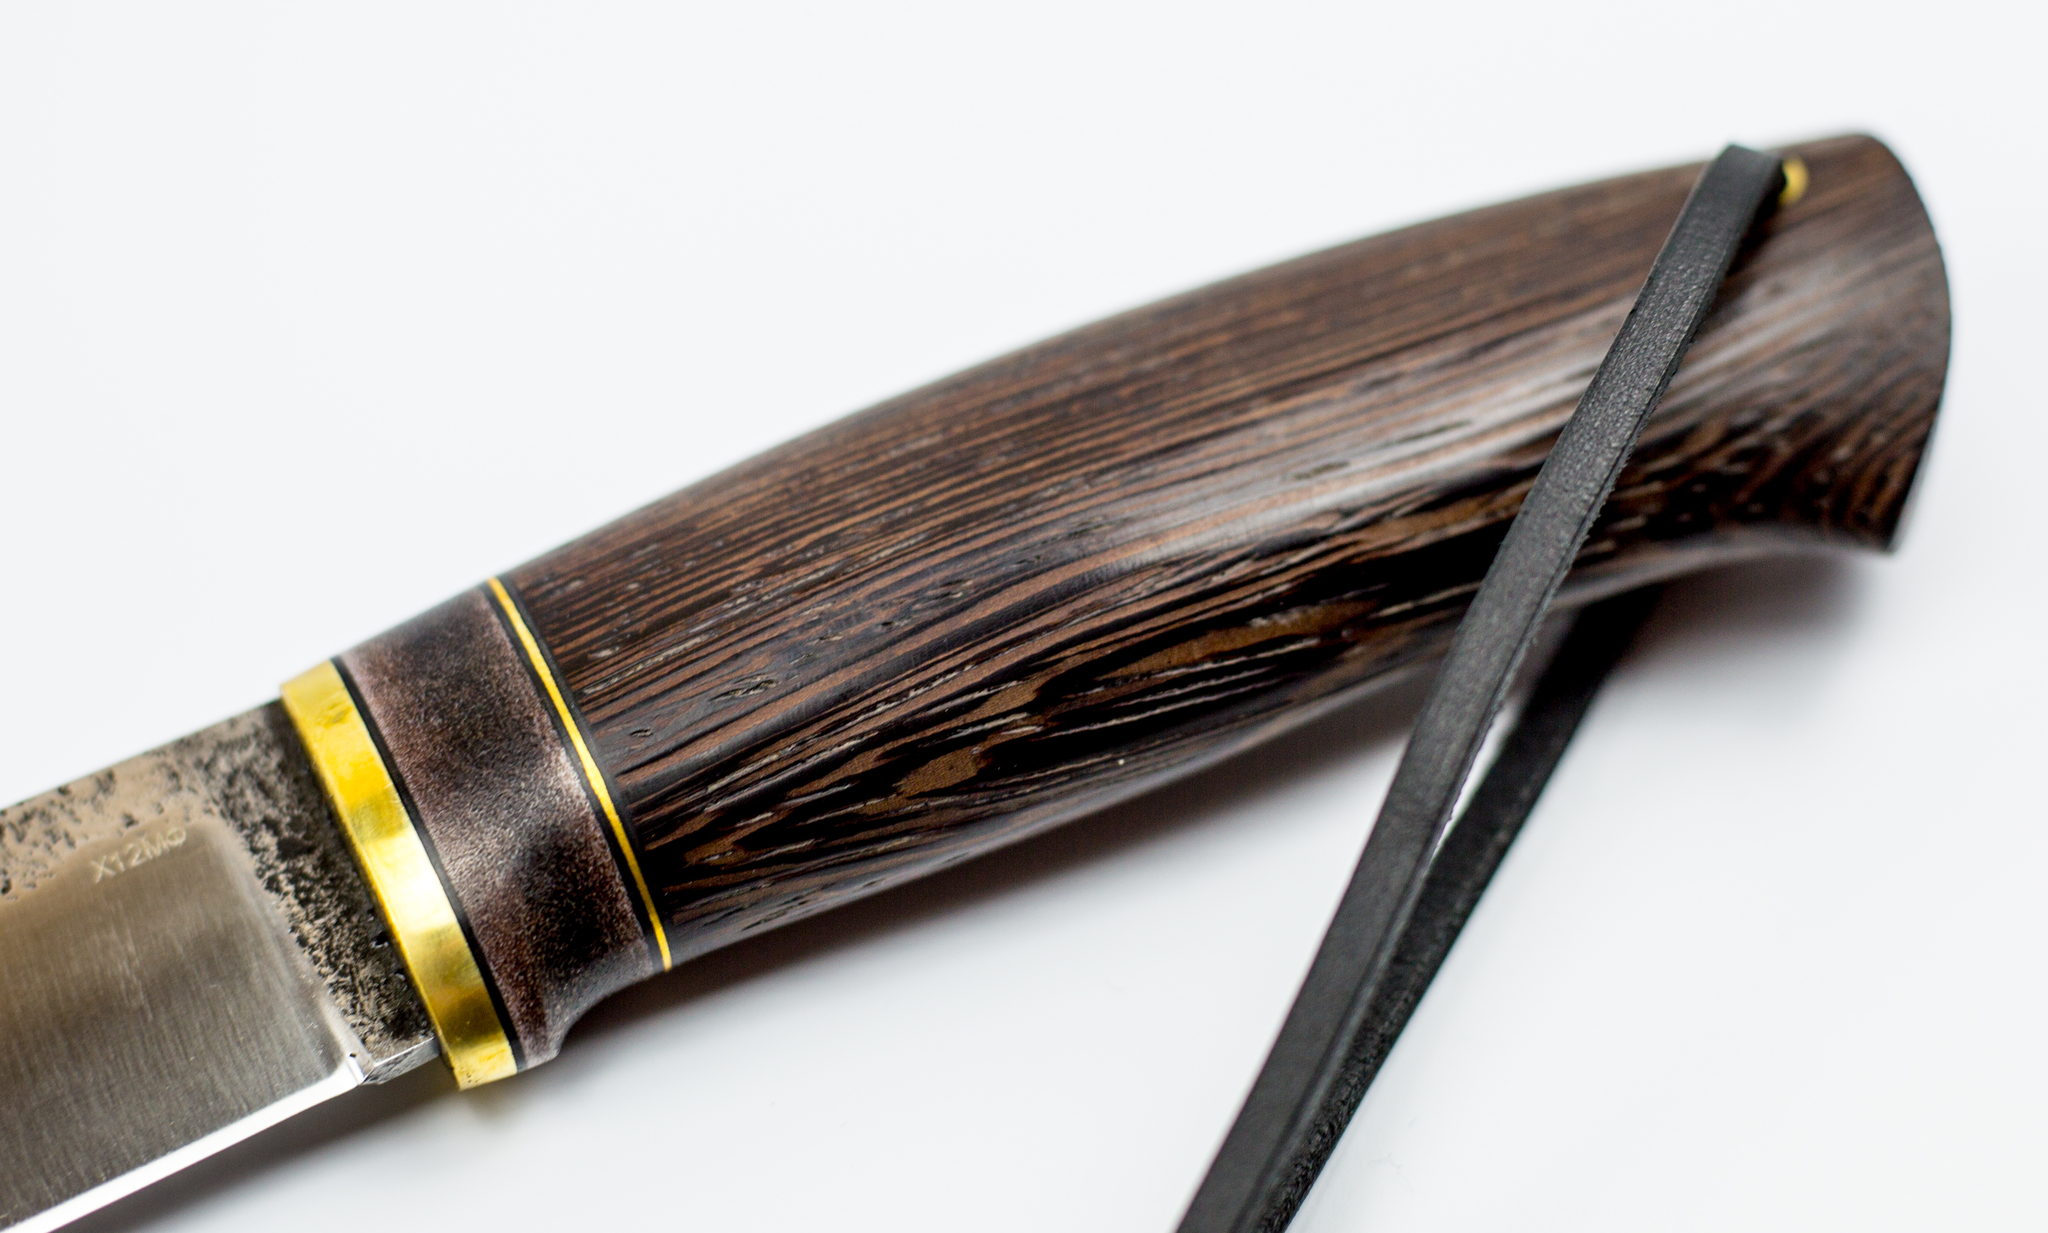 Нож Барбус, сталь Х12МФ, самшит, пирография